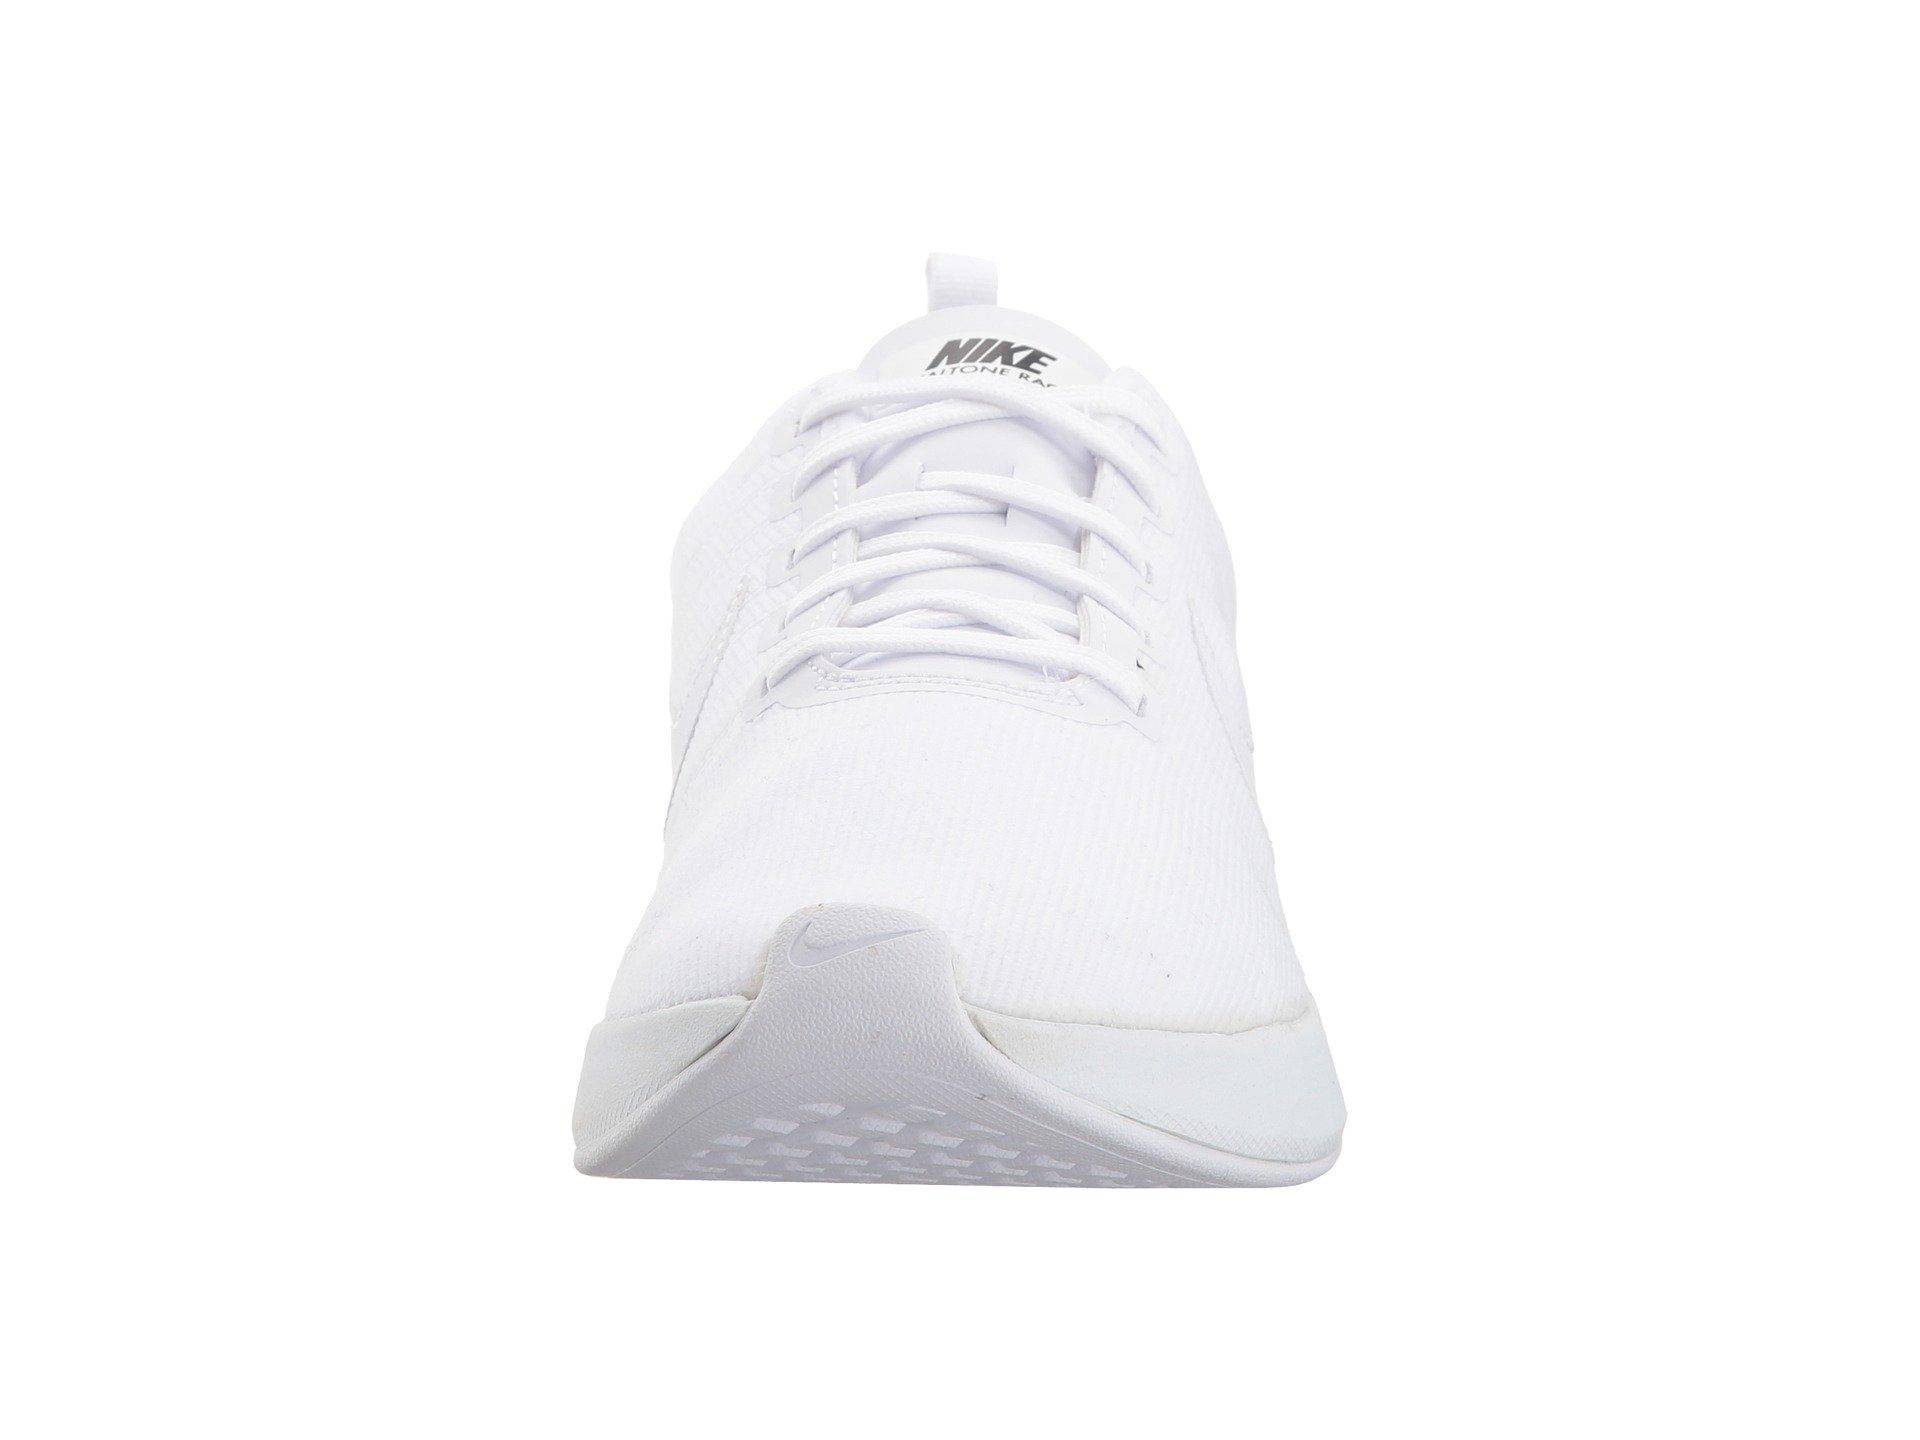 52be01c957a Nike Air Max 97 Vapormax Shoe Shops